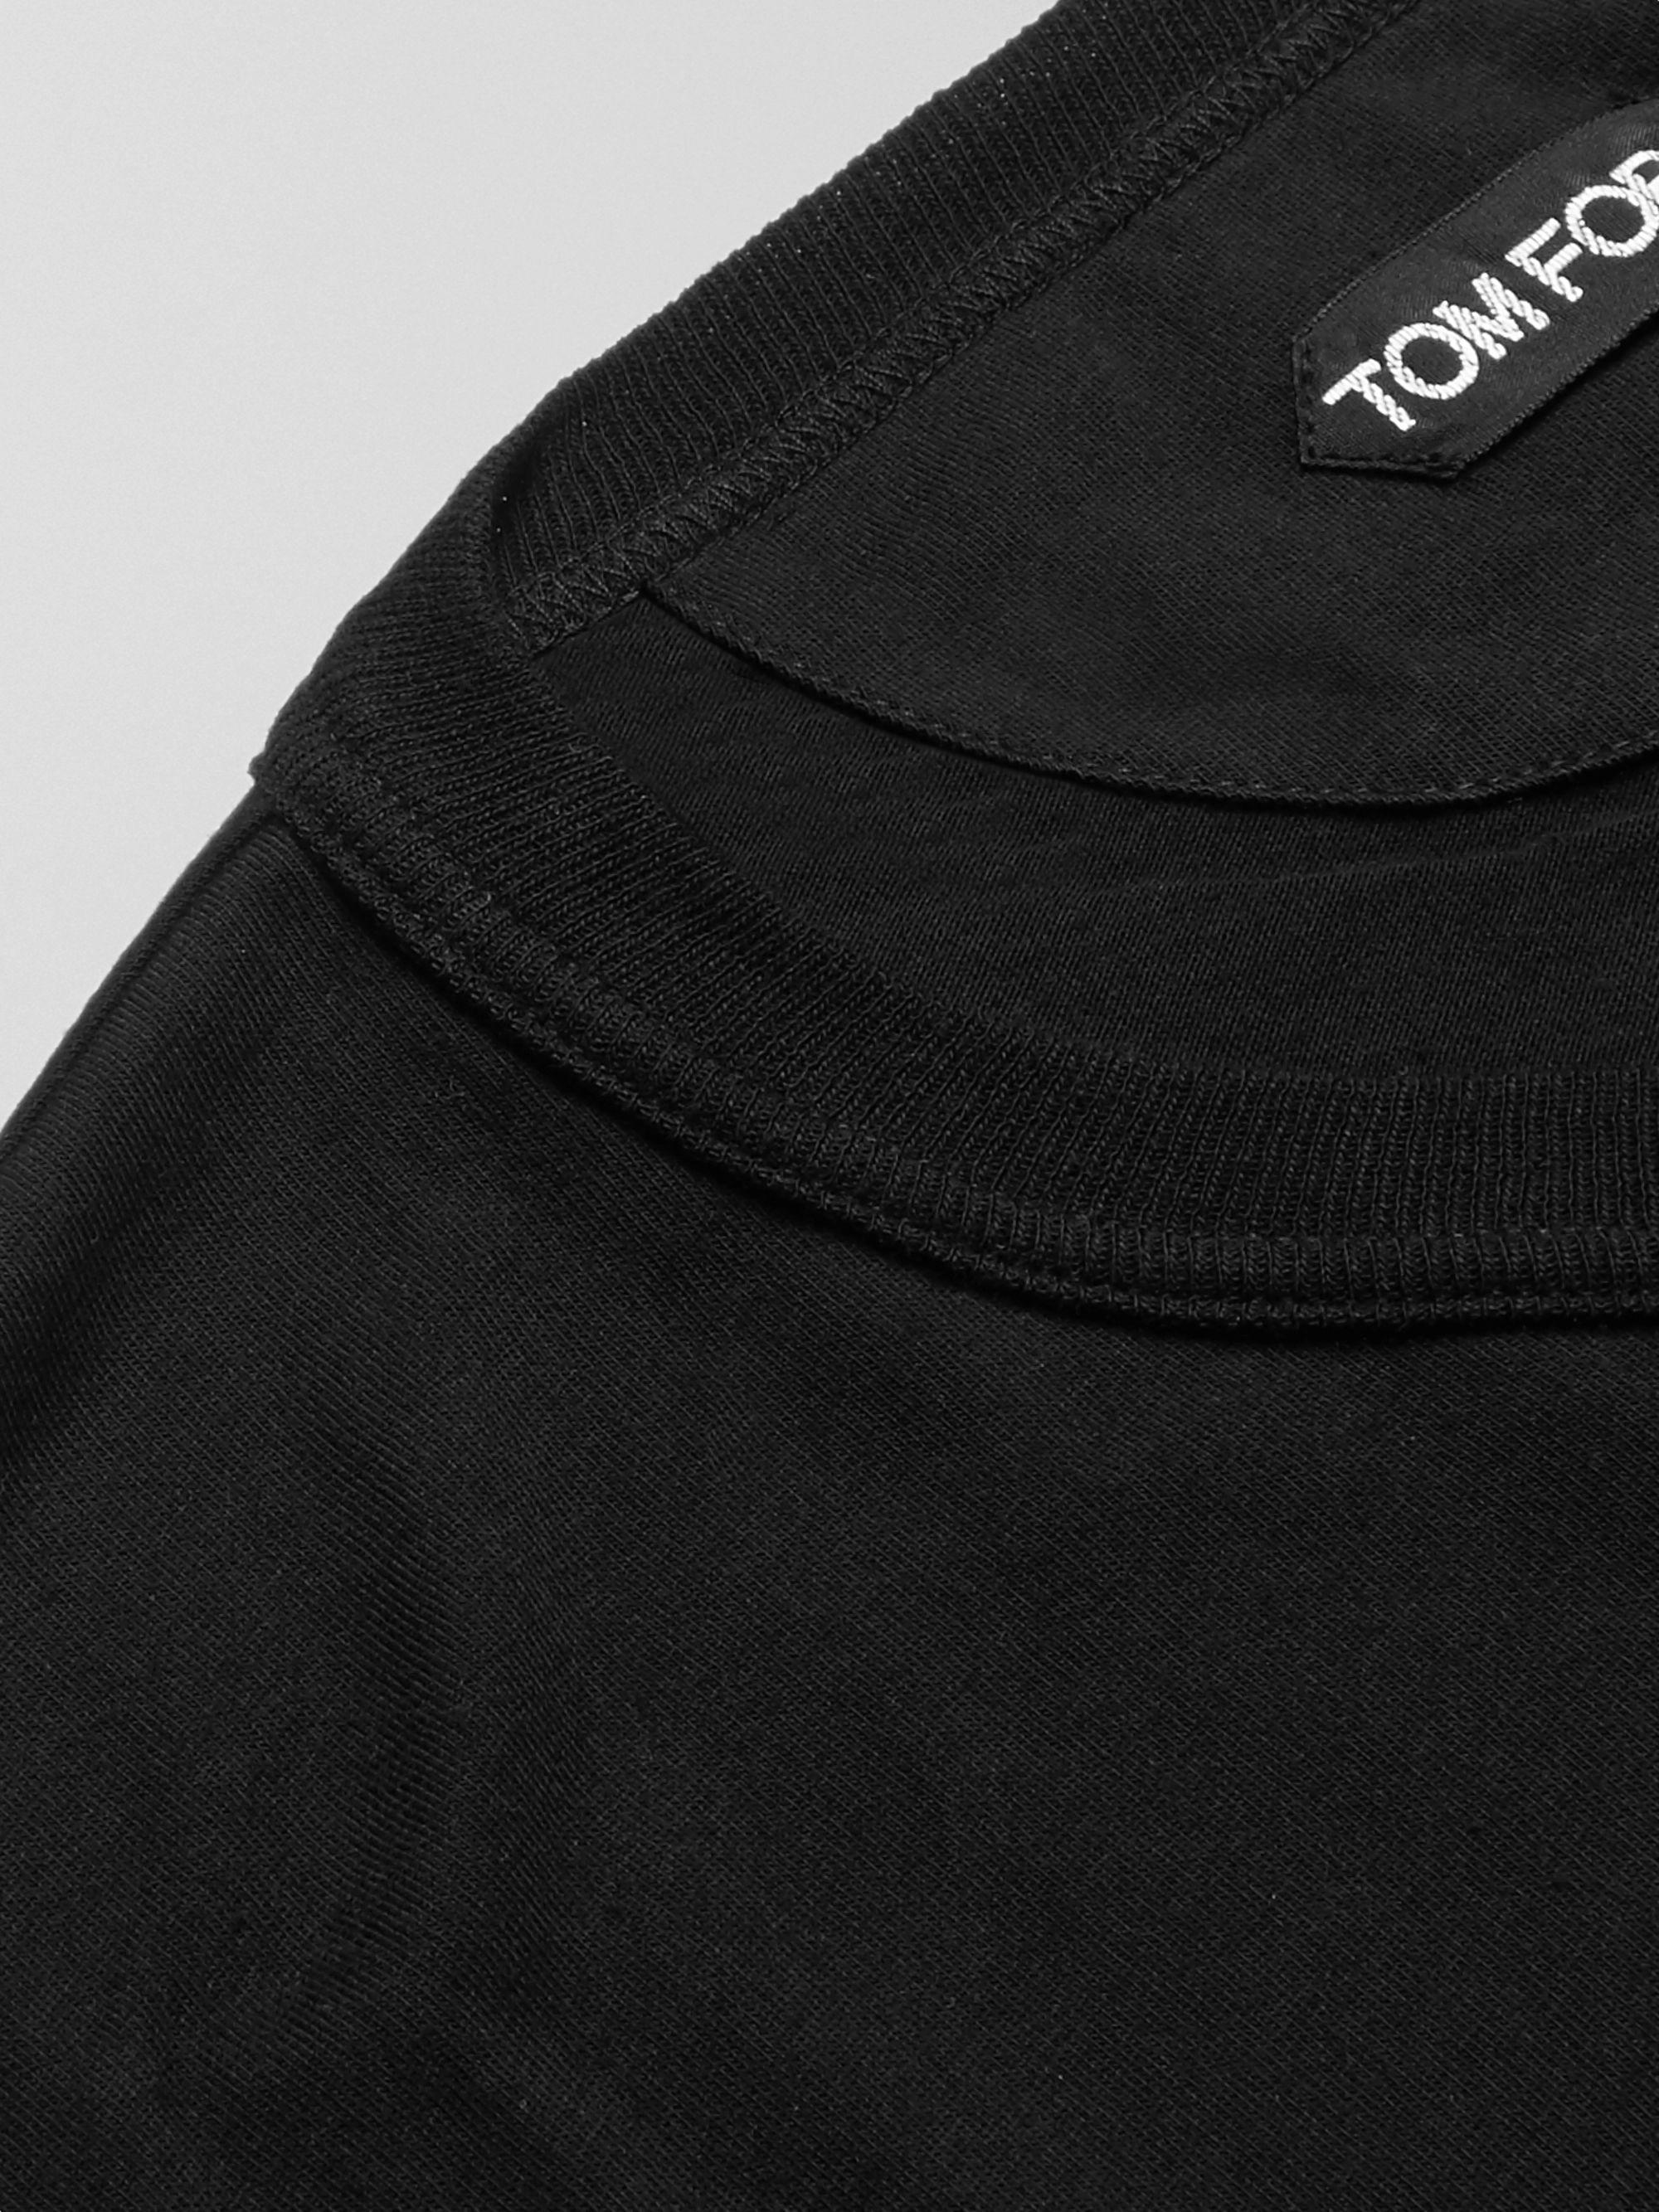 Black Cotton-jersey T-shirt | Tom Ford